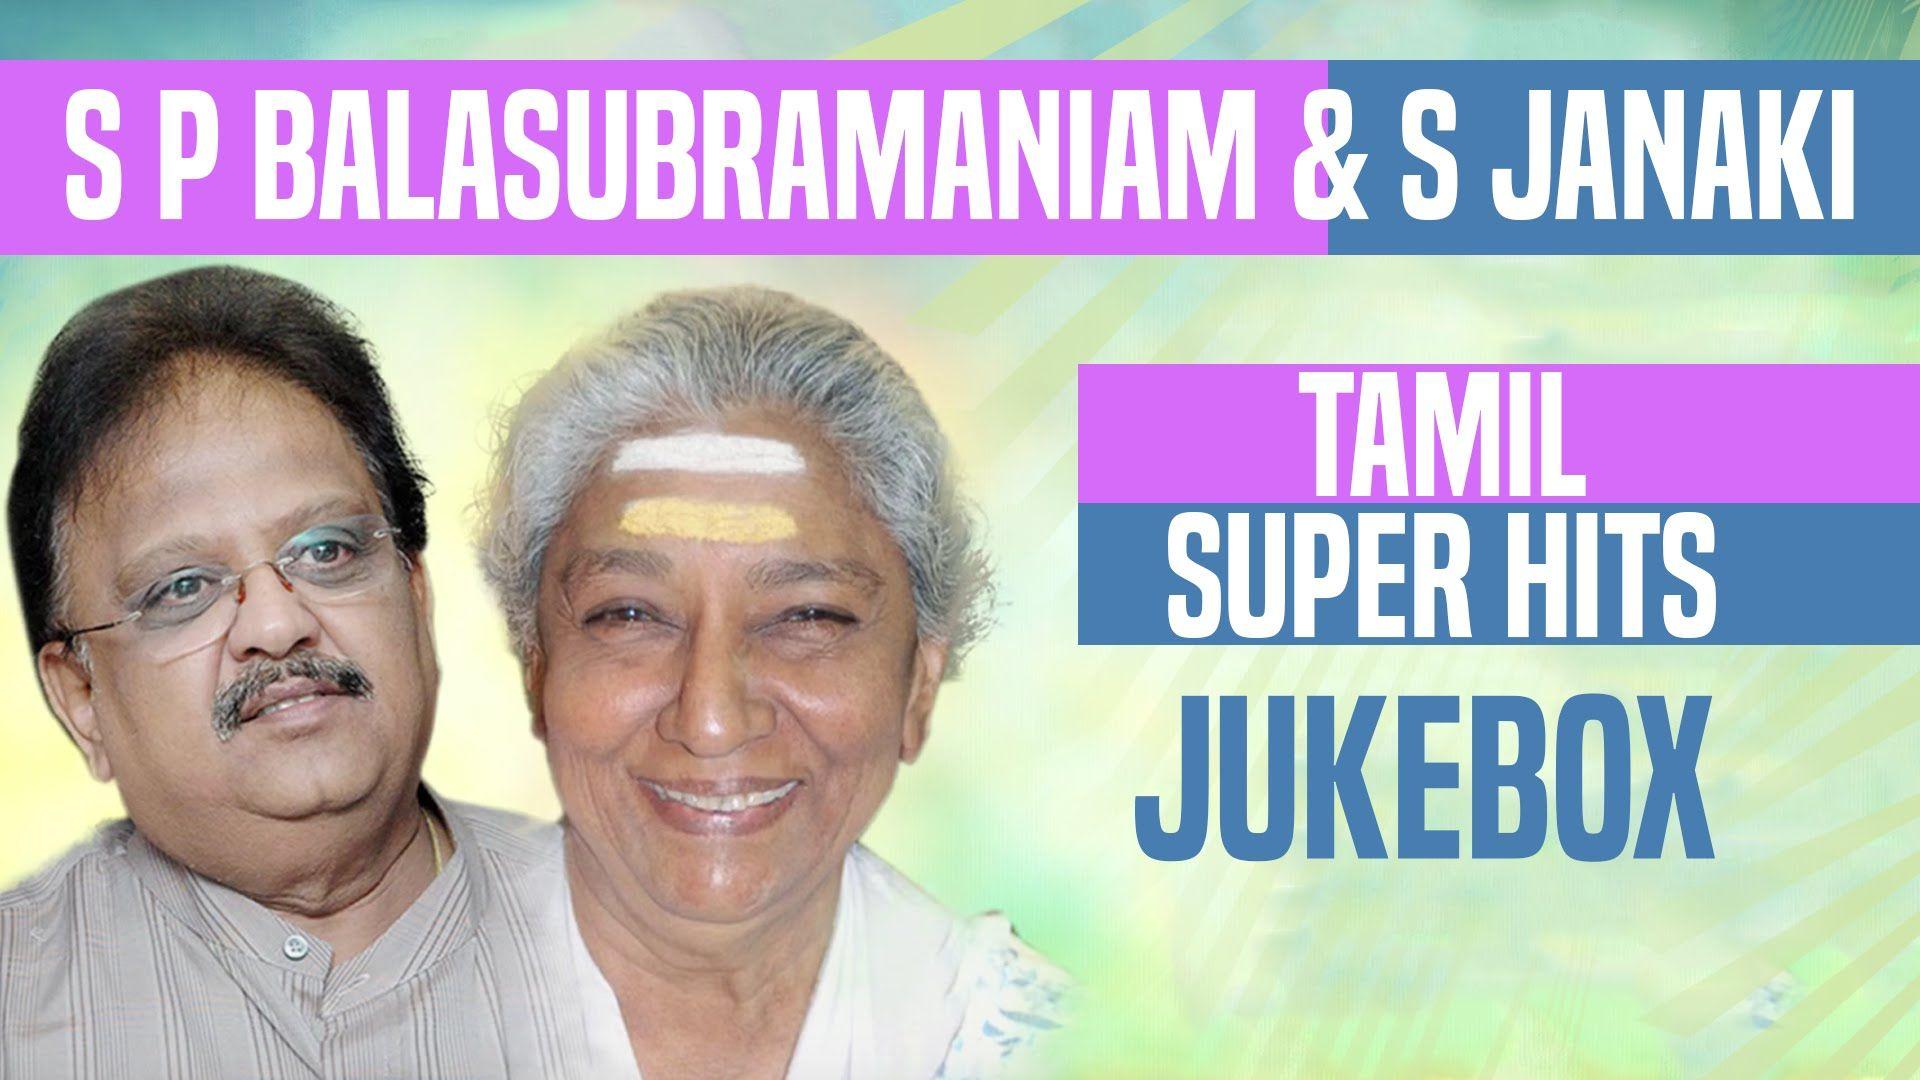 S P Balasubramaniam S Janaki Tamil Super Hits Jukebox Tamil Songs Youtube Musik